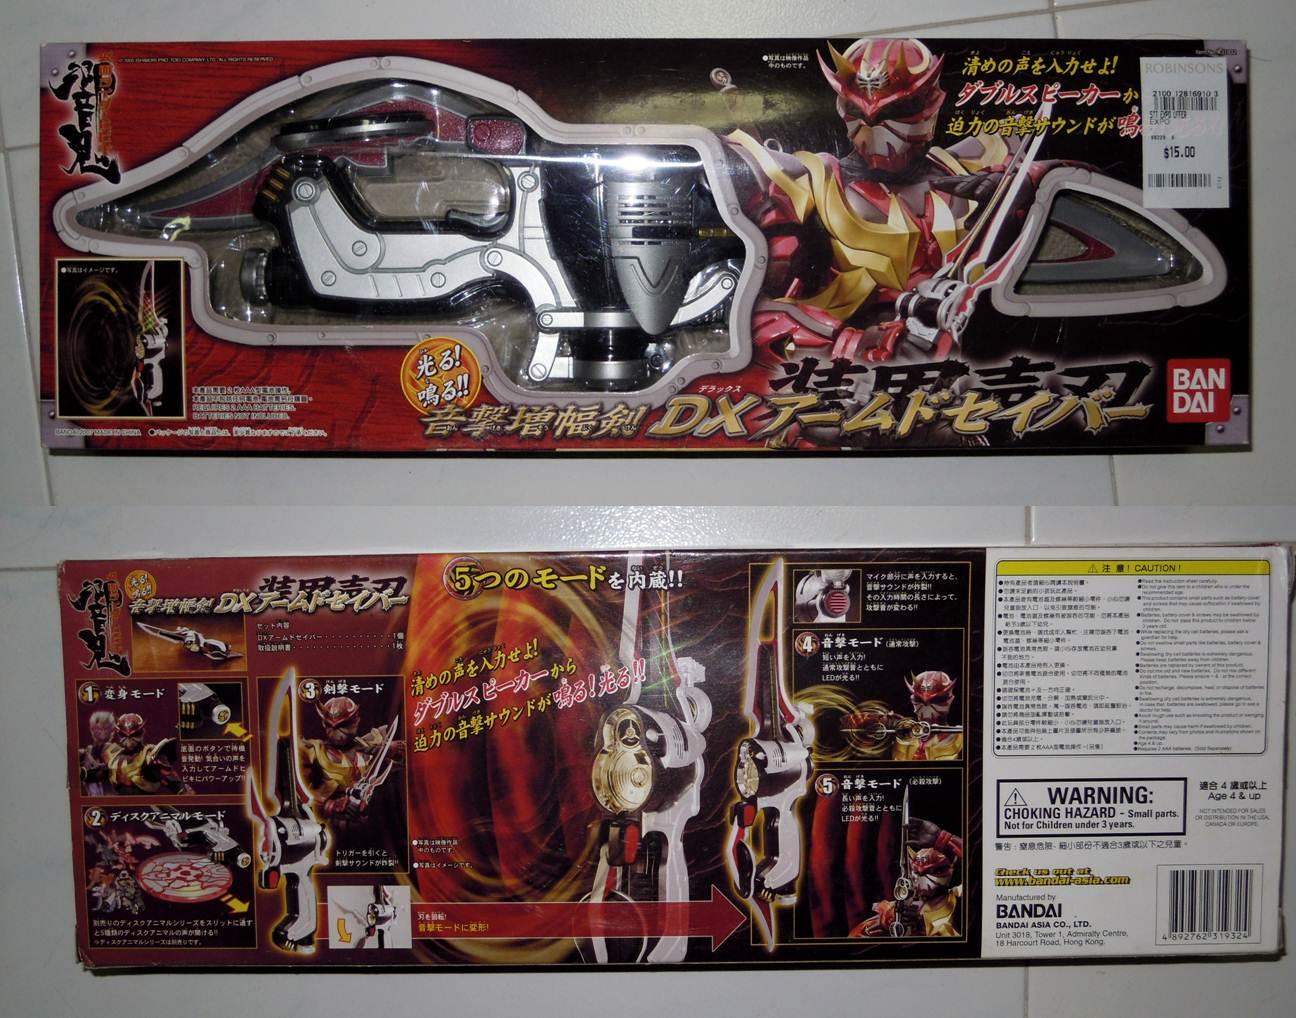 Kamen Rider Fever For Now September Purchase 1 Kr Hibiki Dx Armed Saber